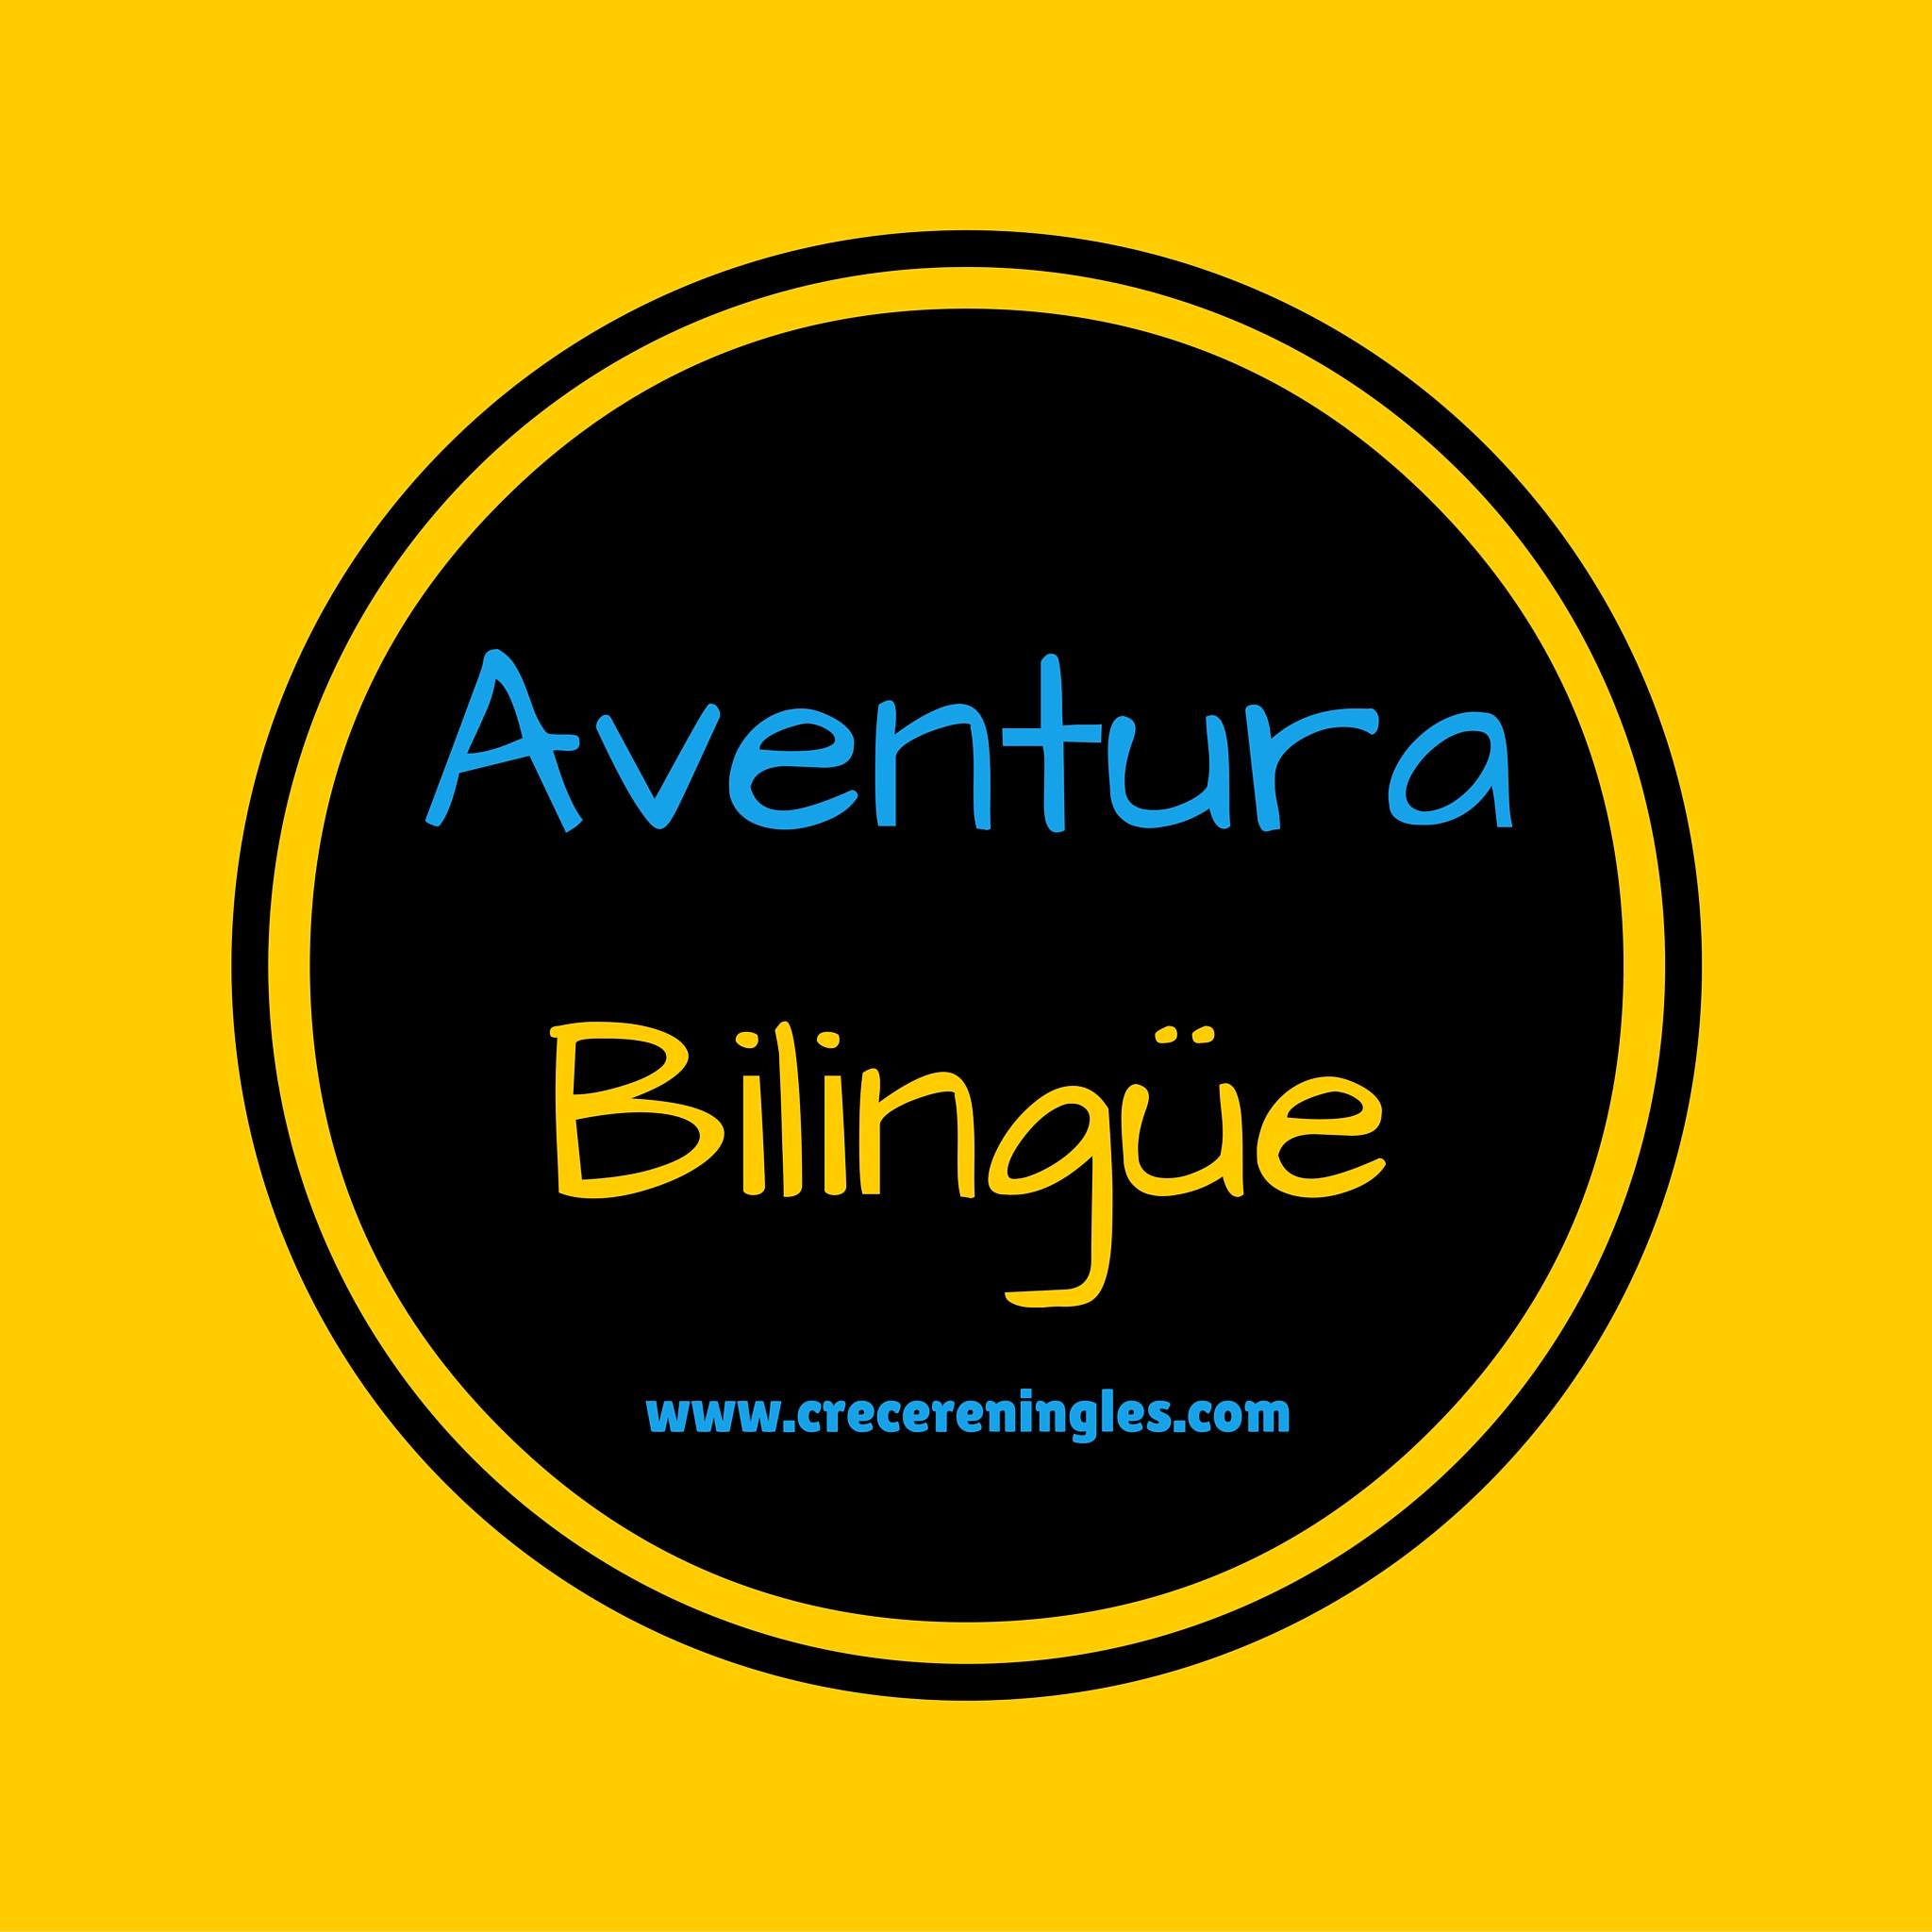 Logo de Aventura Bilingüe